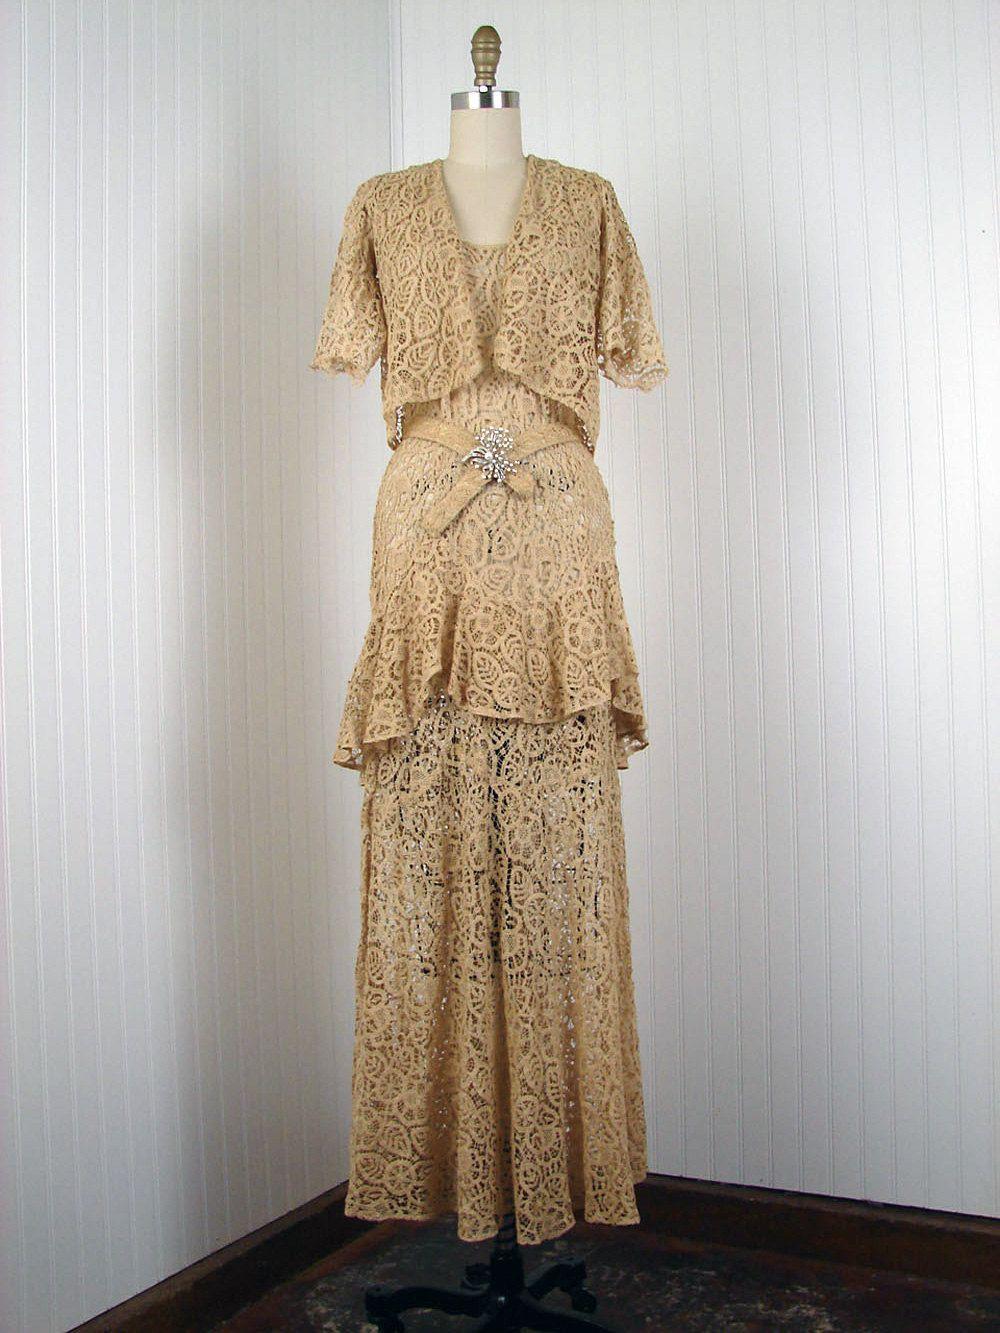 1920 wedding dress  s Wedding Dress  Wedded bliss  Pinterest  s wedding